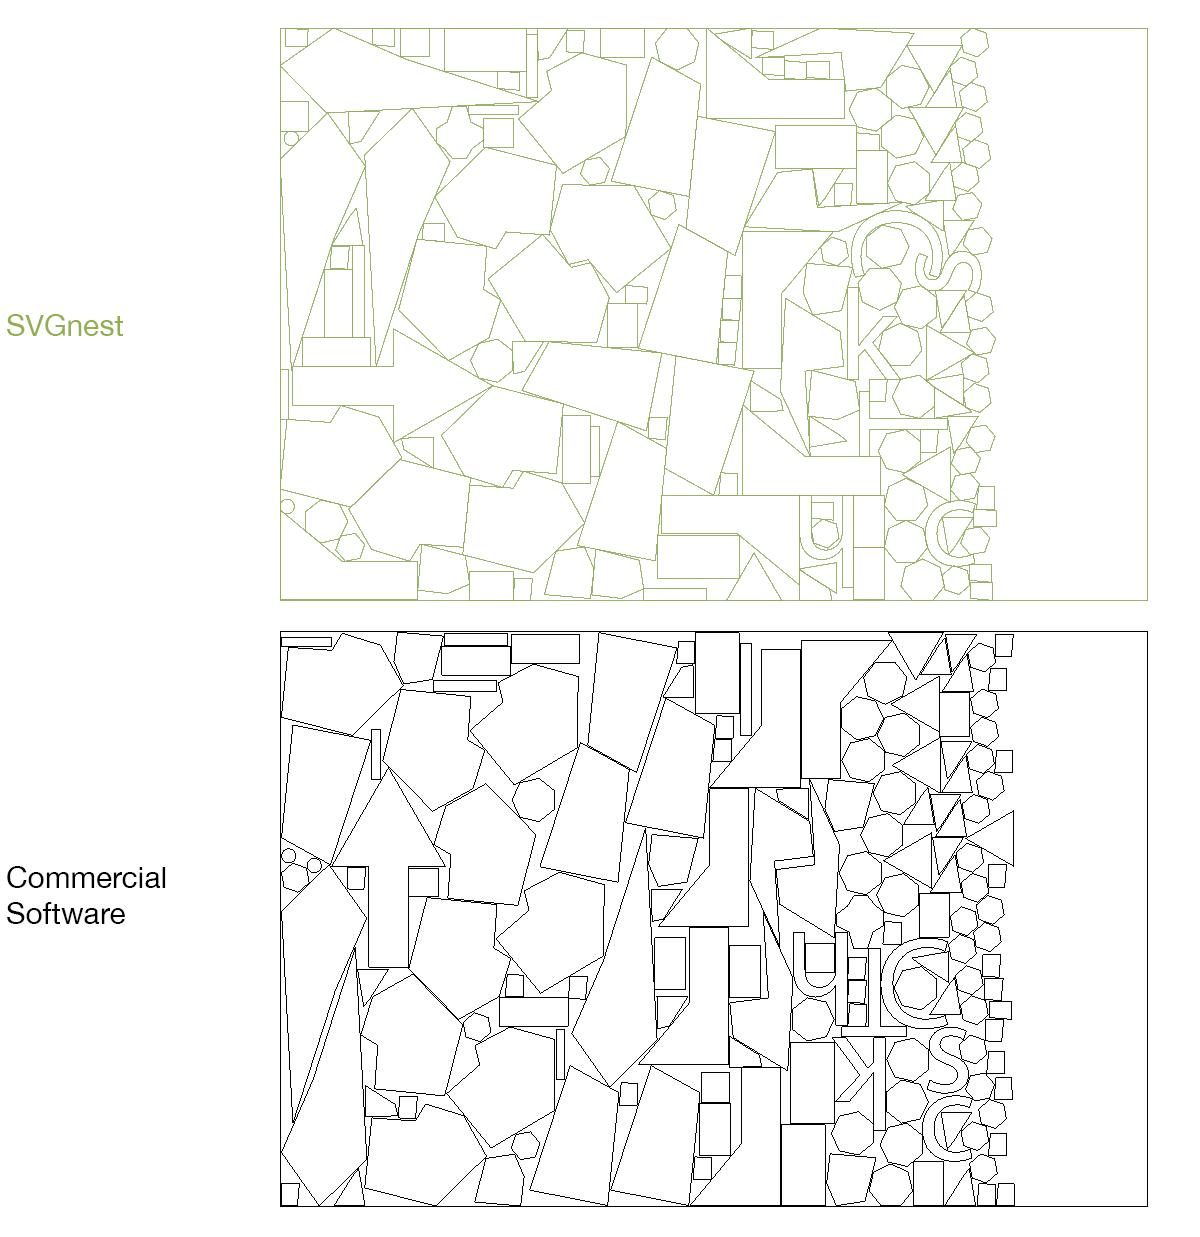 SVGnest comparison